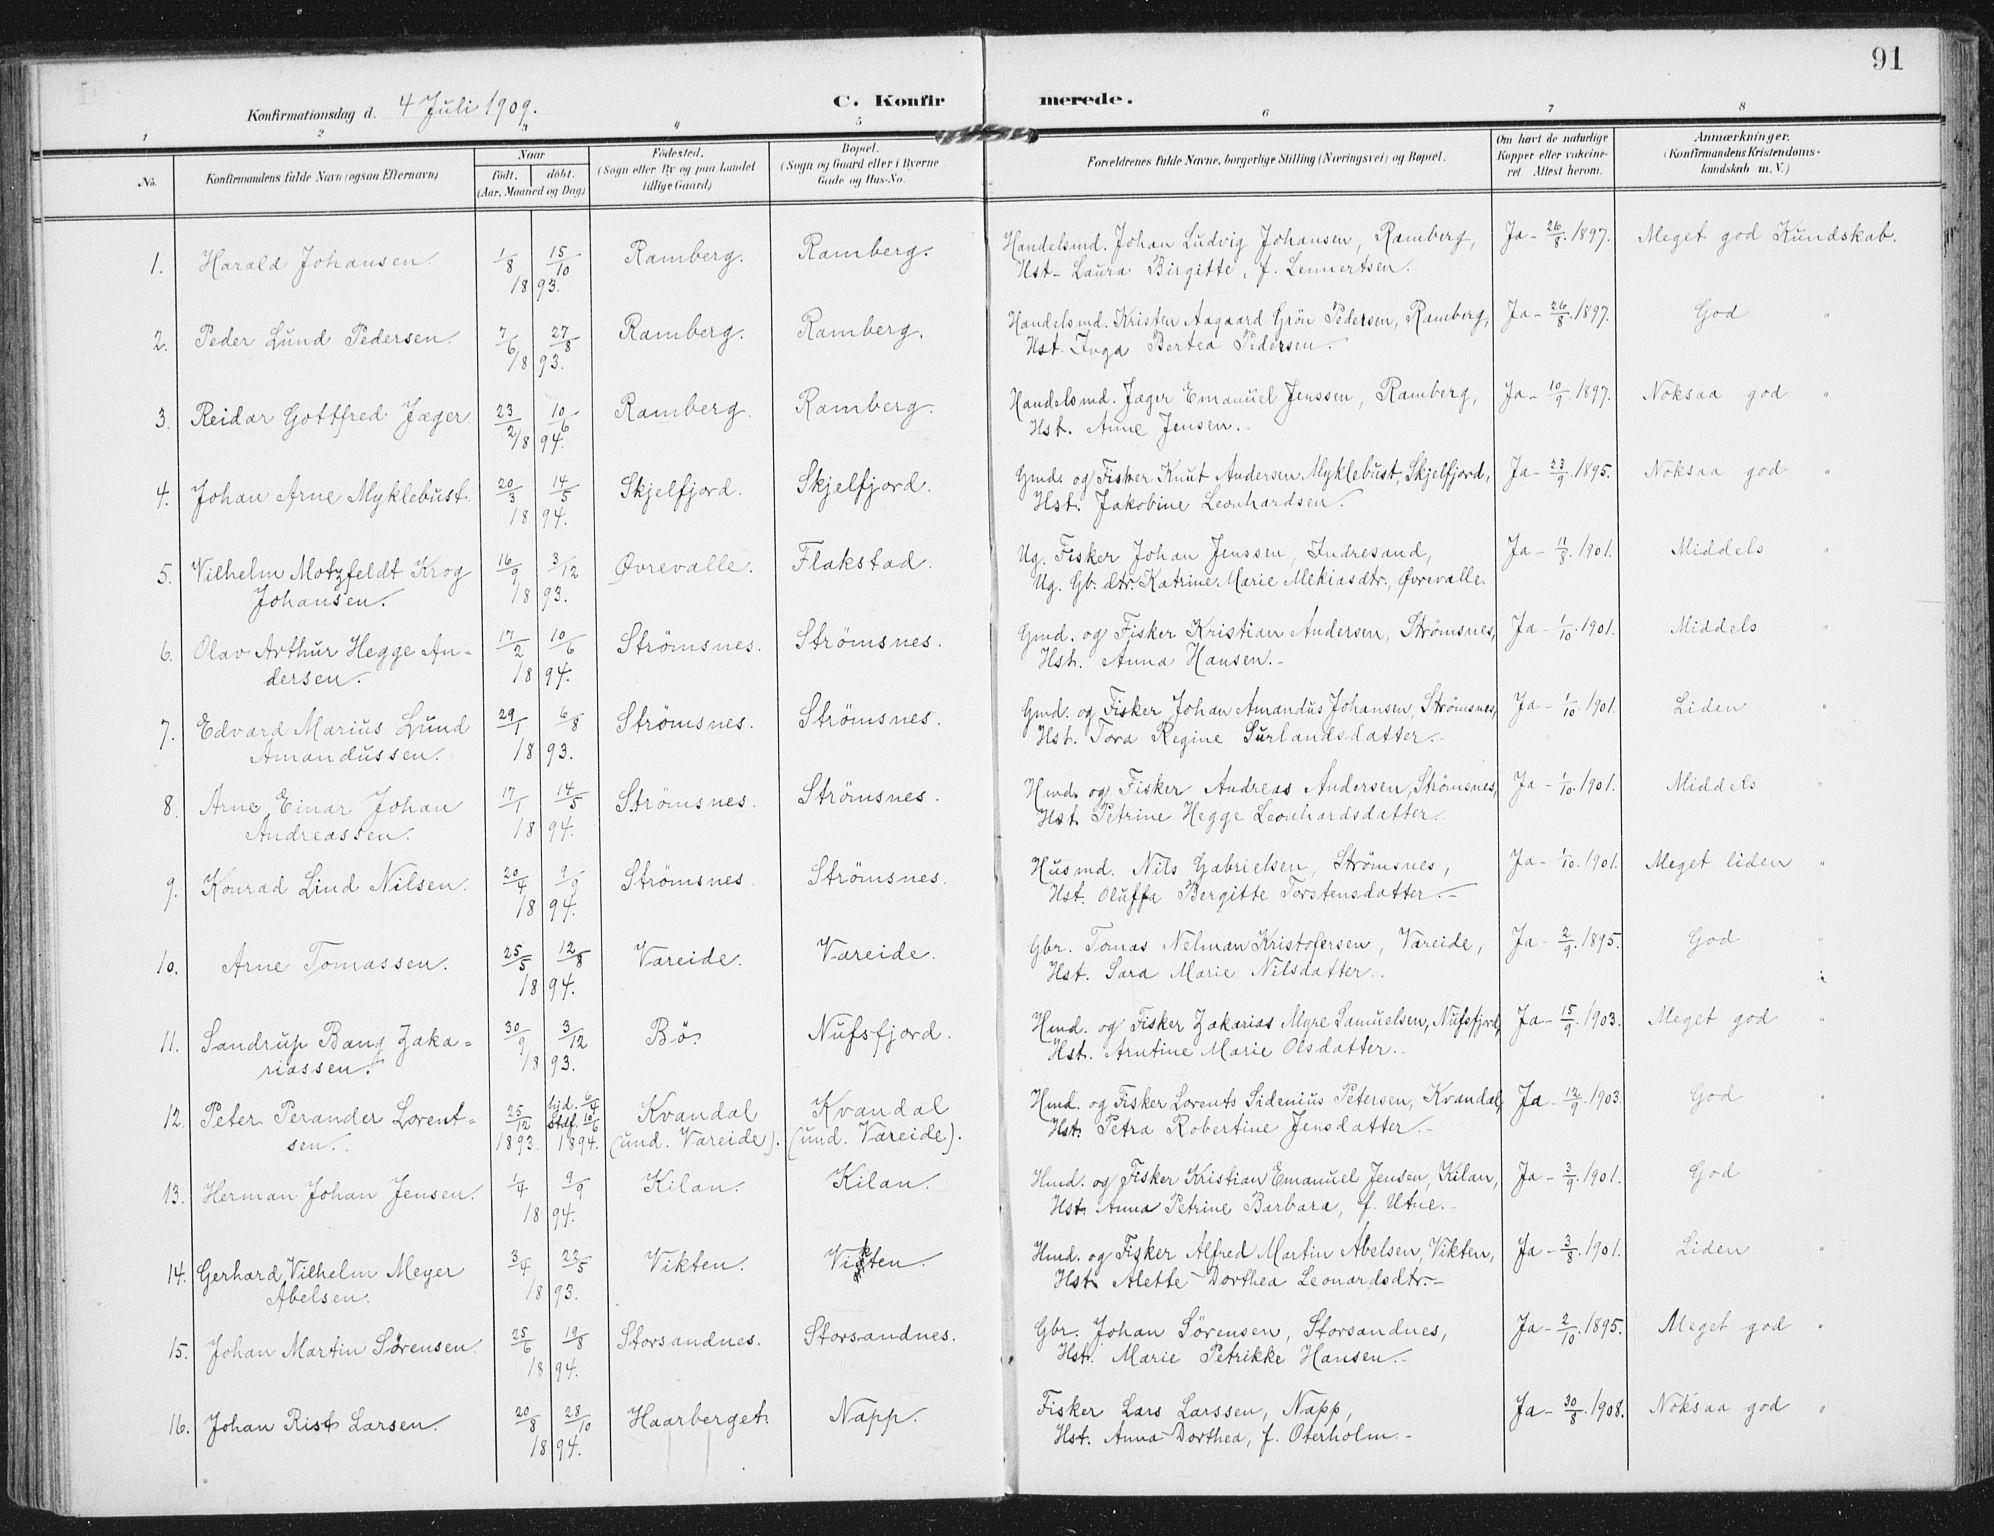 SAT, Ministerialprotokoller, klokkerbøker og fødselsregistre - Nordland, 885/L1206: Ministerialbok nr. 885A07, 1905-1915, s. 91